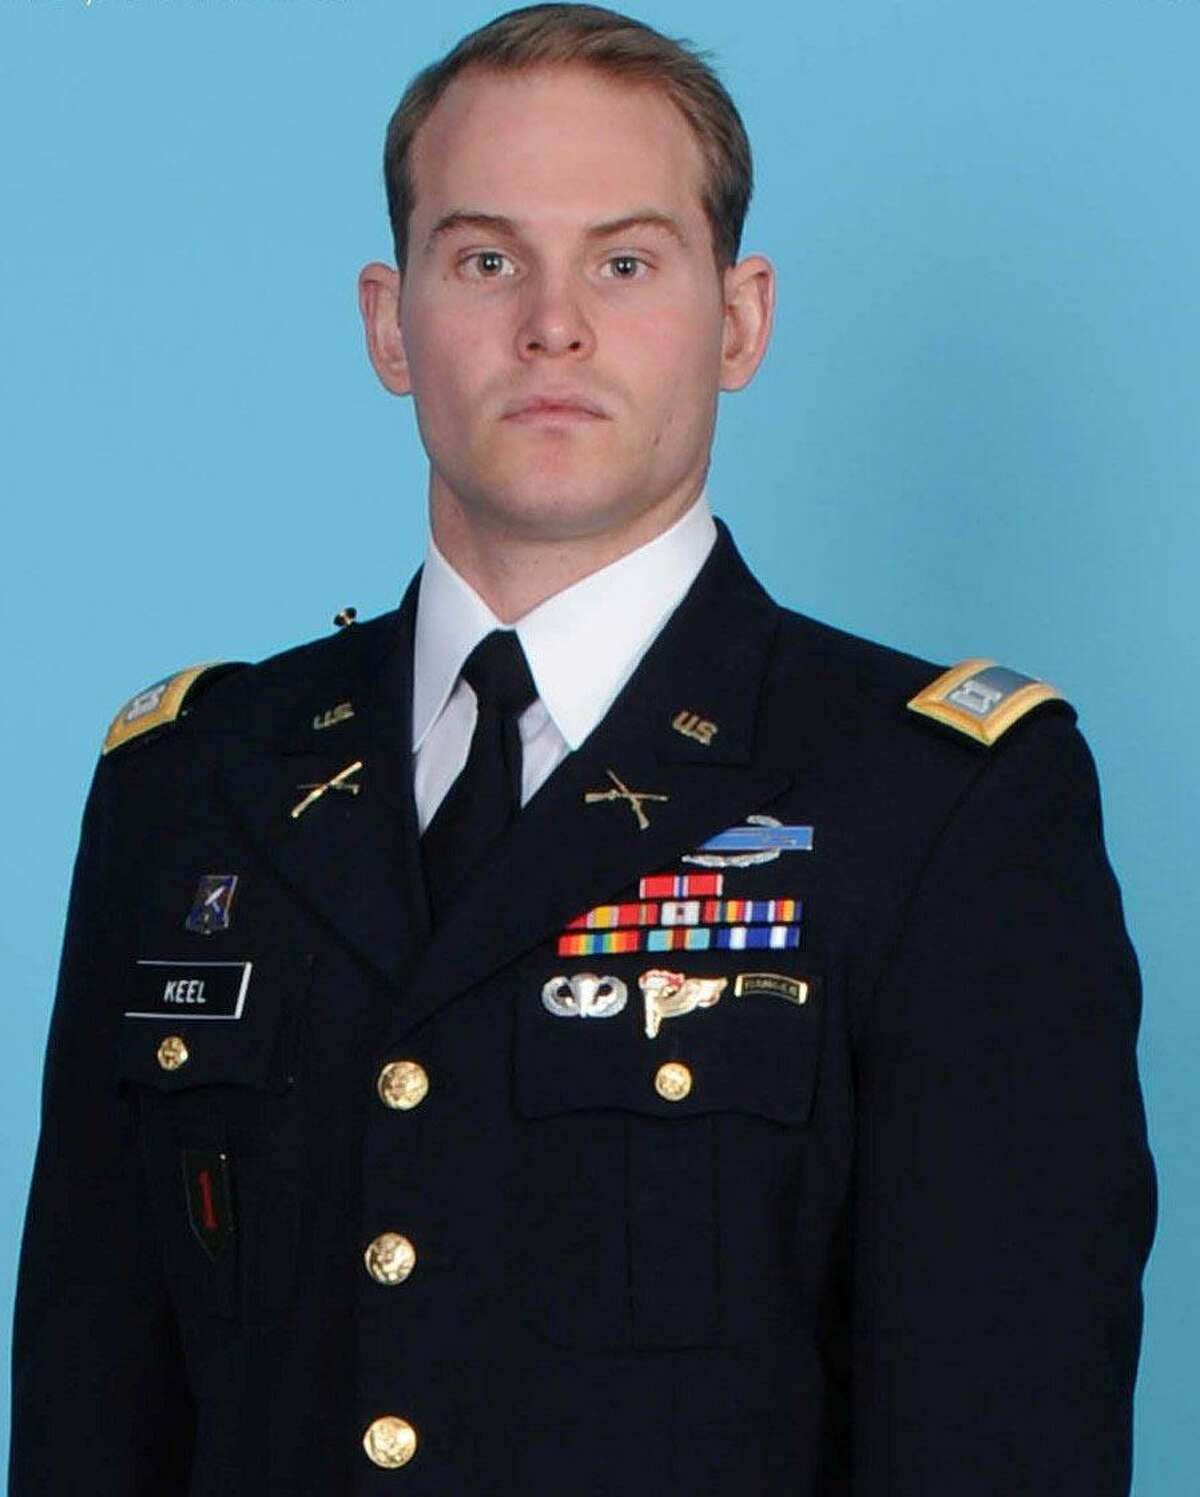 Capt. Andrew Pedersen-Keel. U.S. Army photo.